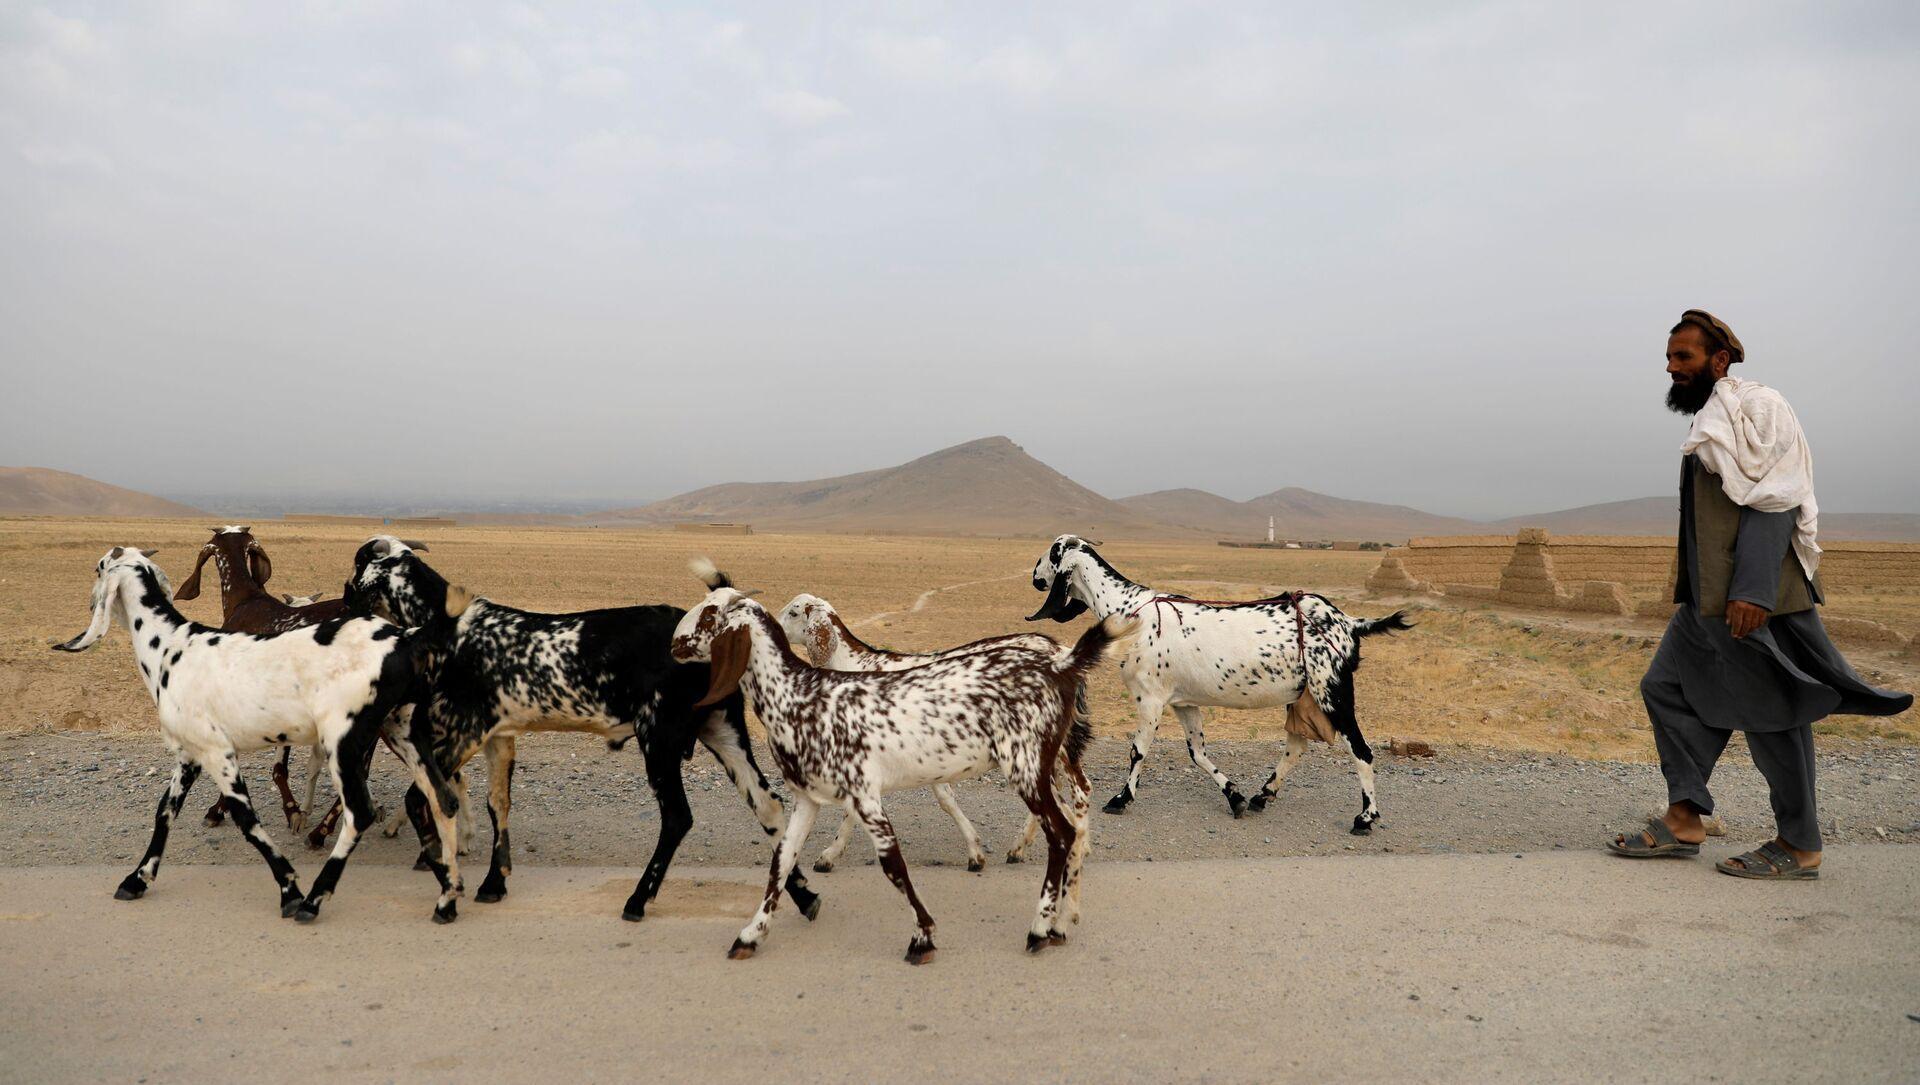 An Afghan man walks with his goats on the outskirts of Kabul, Afghanistan July 13, 2021. - Sputnik International, 1920, 27.07.2021